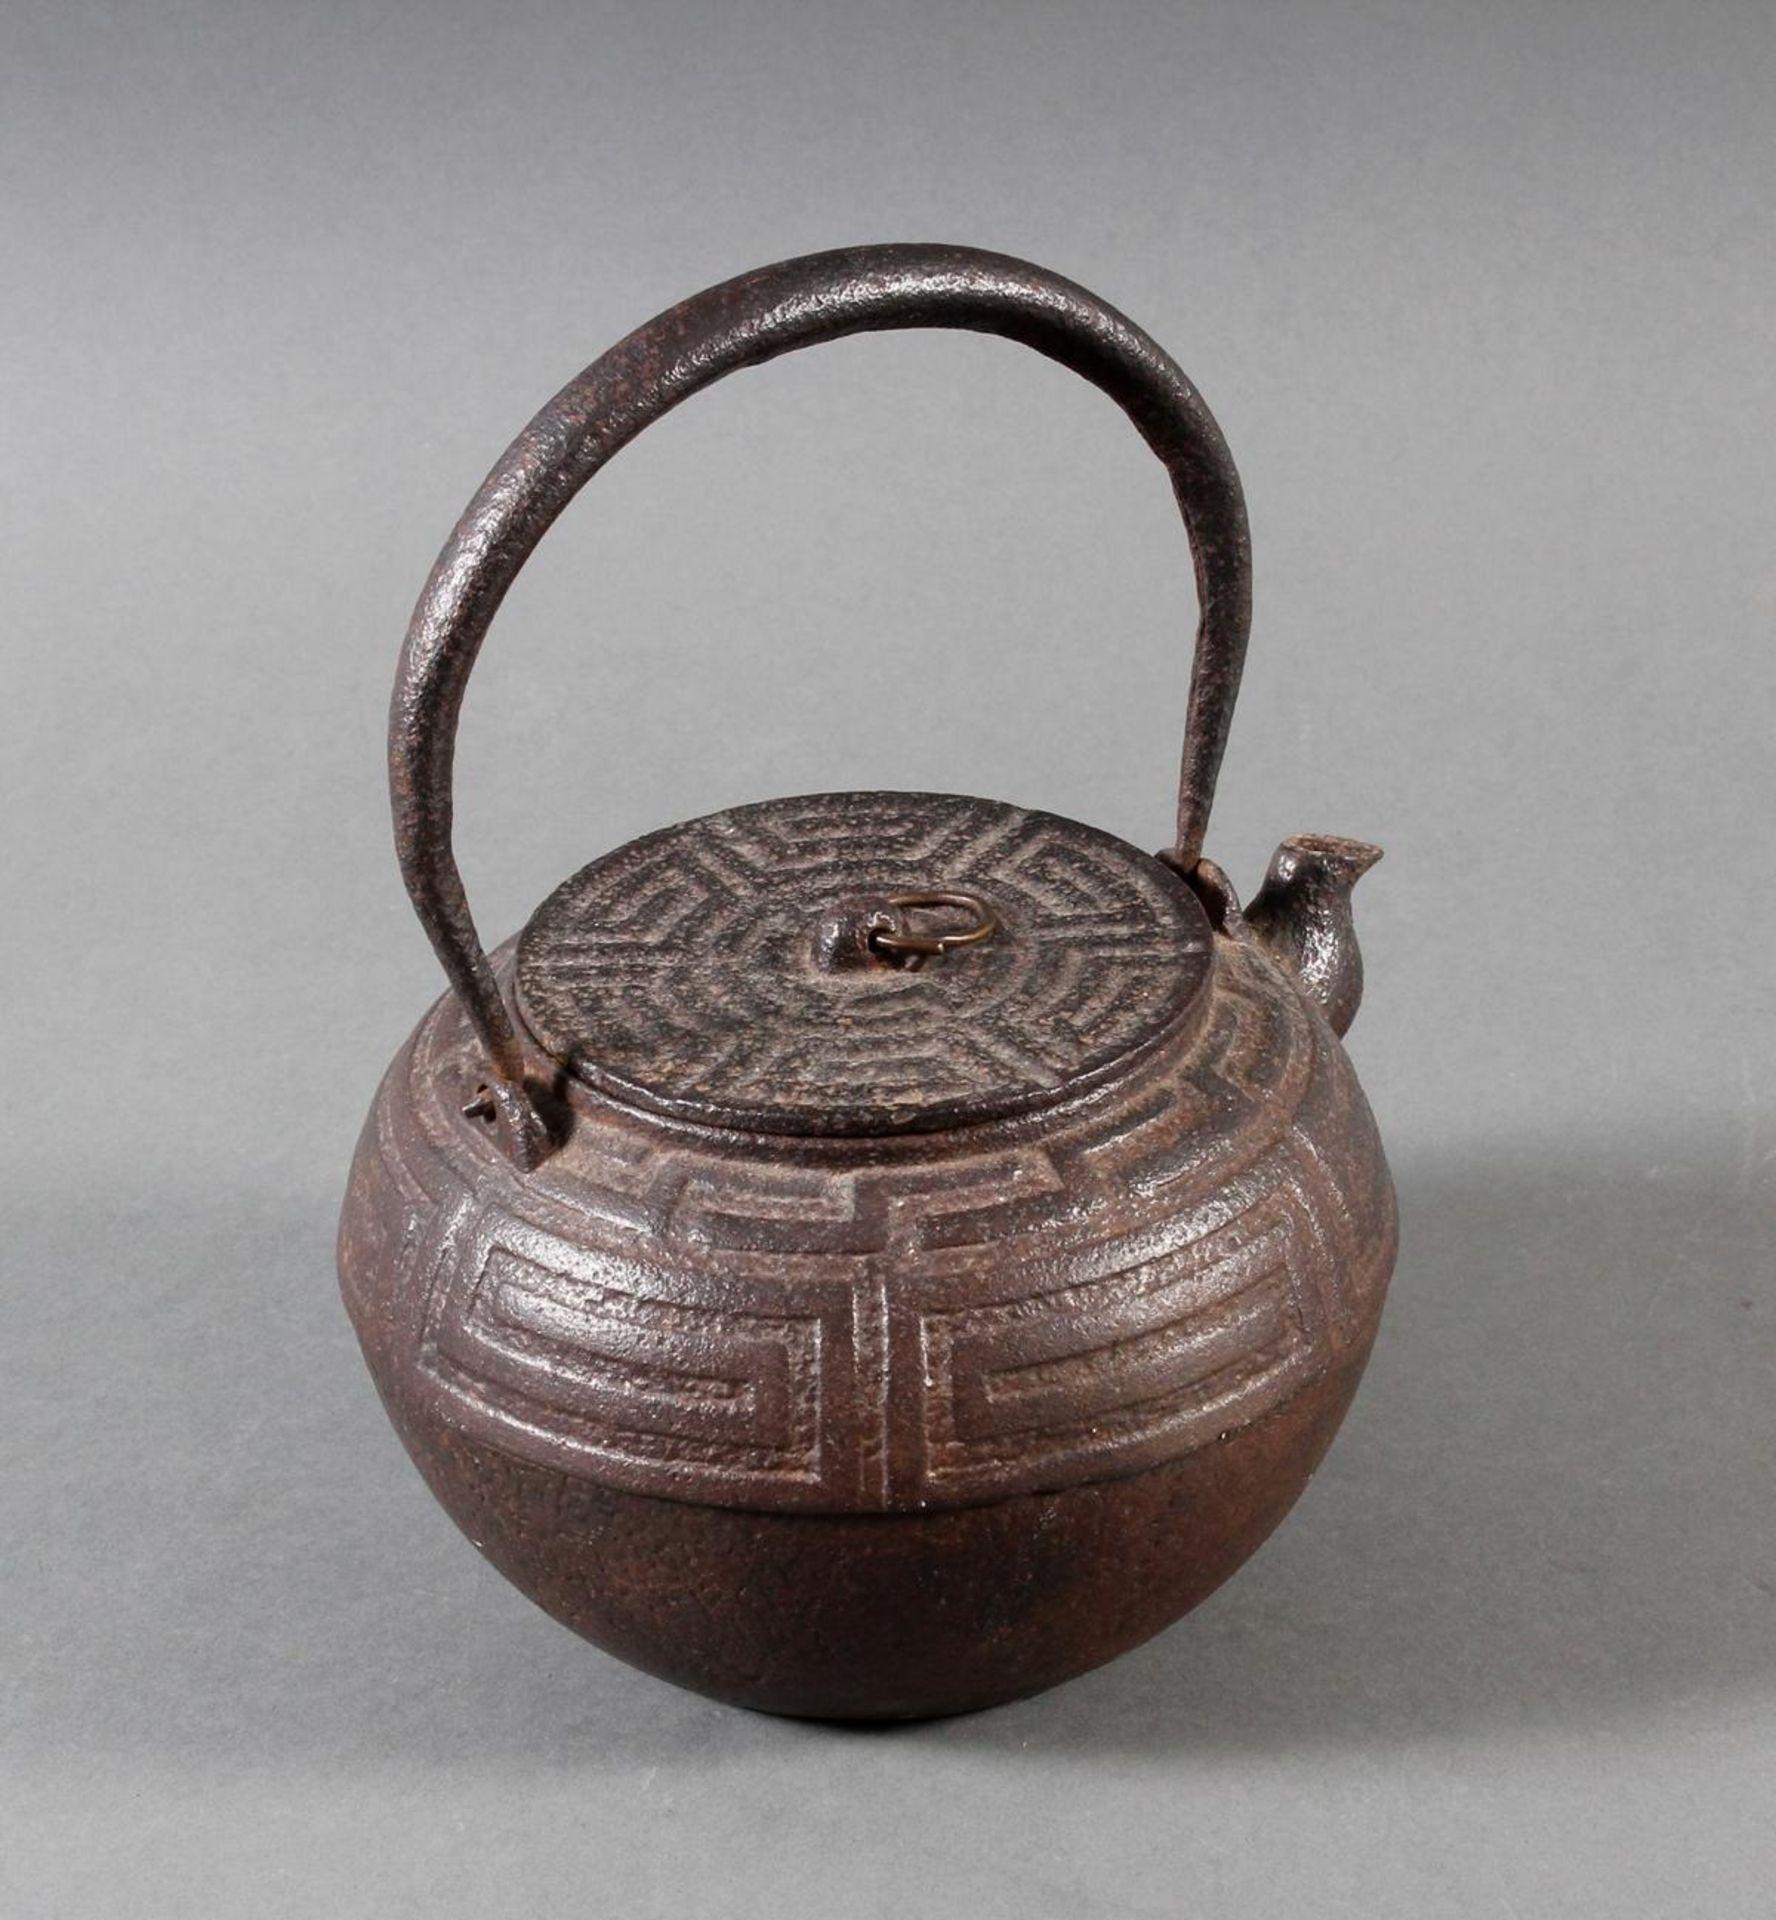 Gusseiserner Wasserkessel, China 18./19. Jahrhundert - Bild 2 aus 8